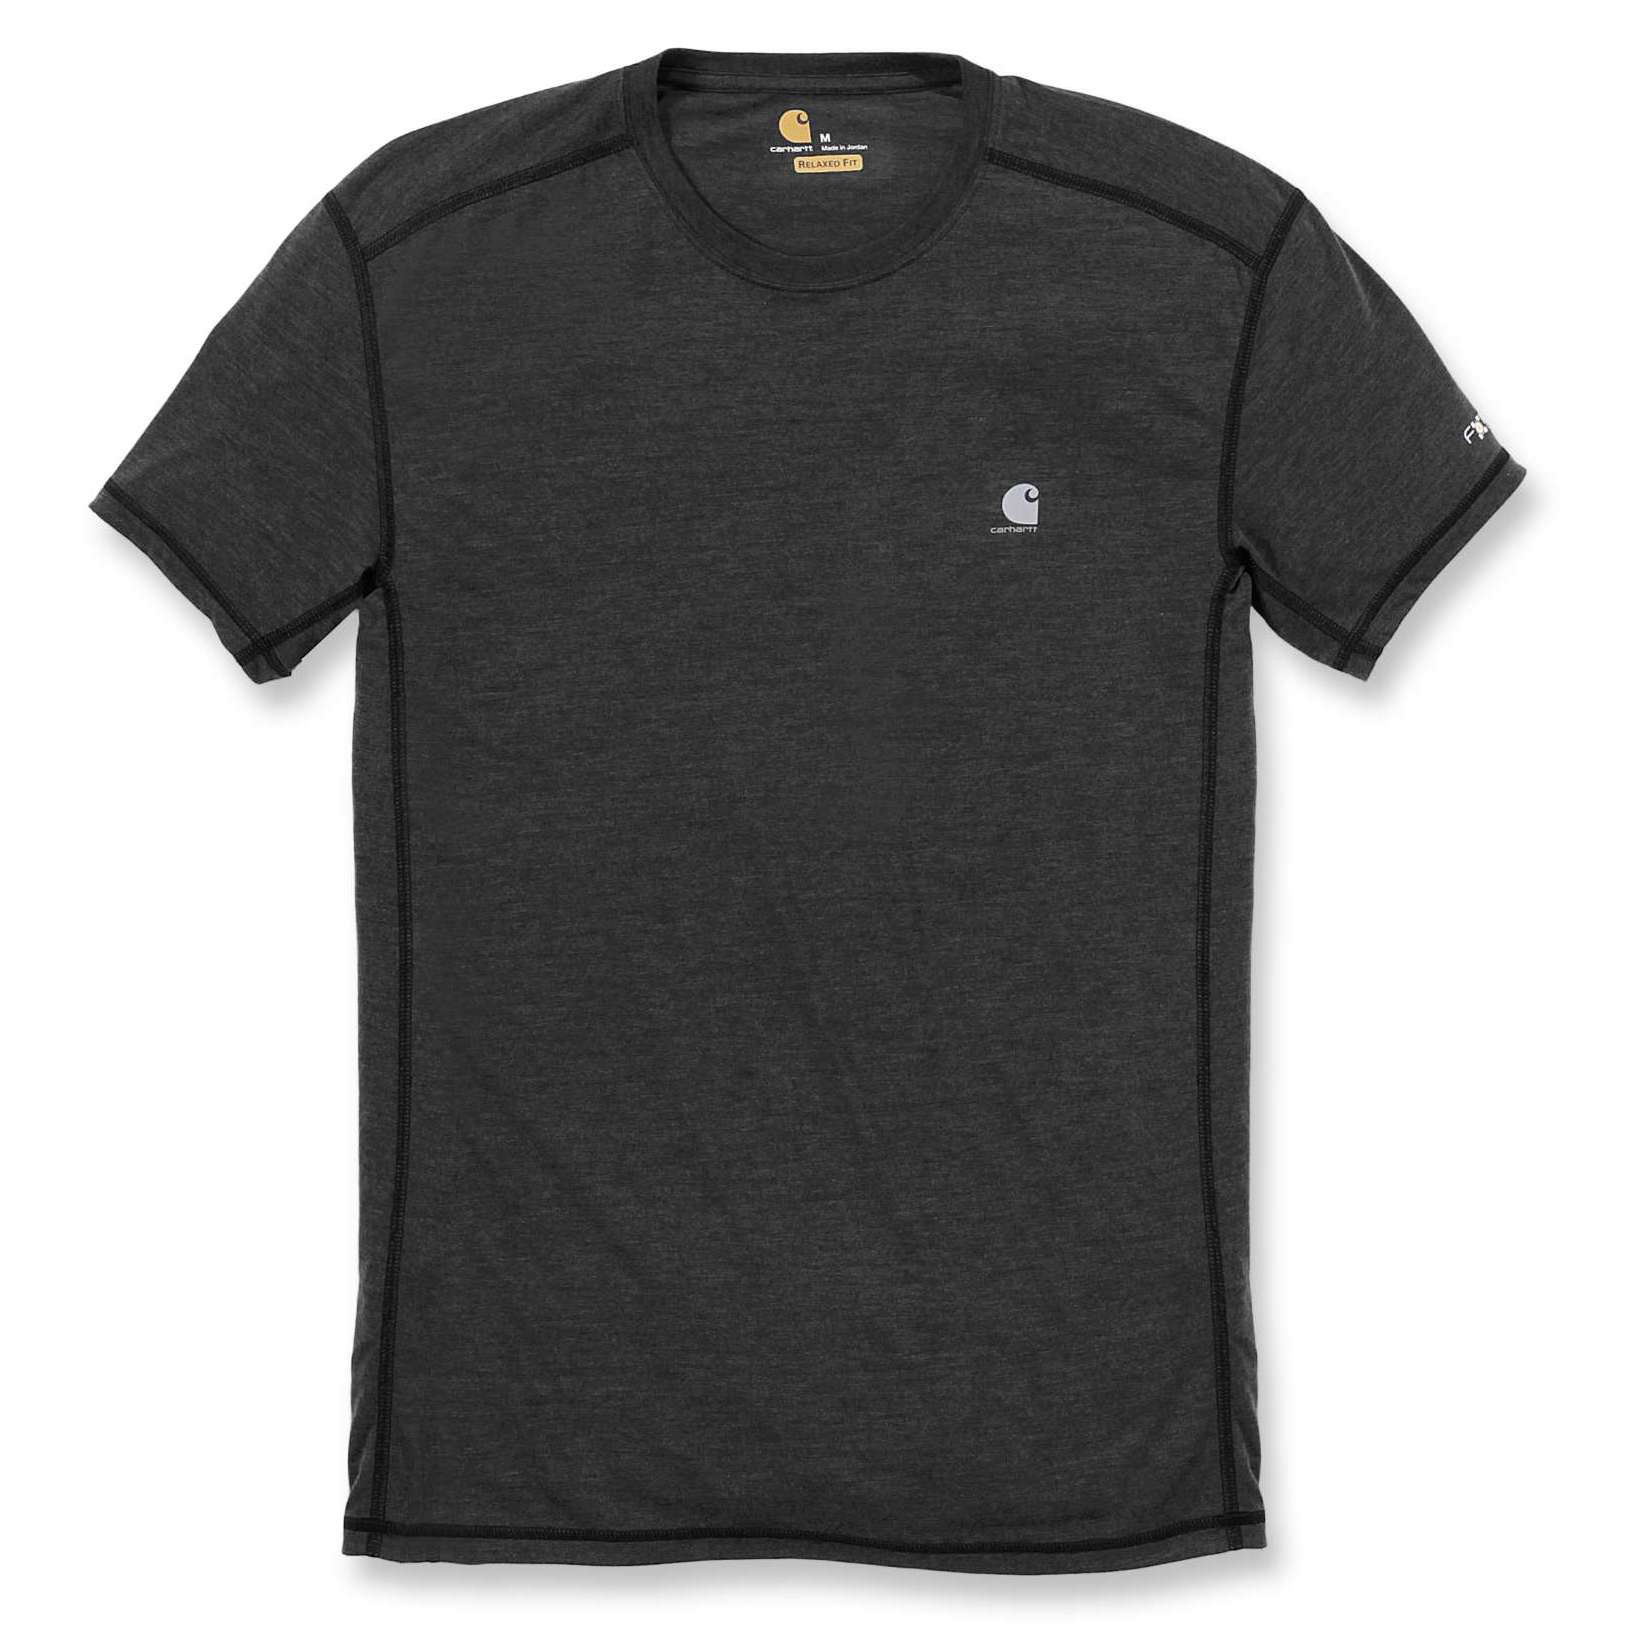 Футболка Carhartt Force Extremes T-Shirt S/S - 102960 (Black/Black Heather; M)